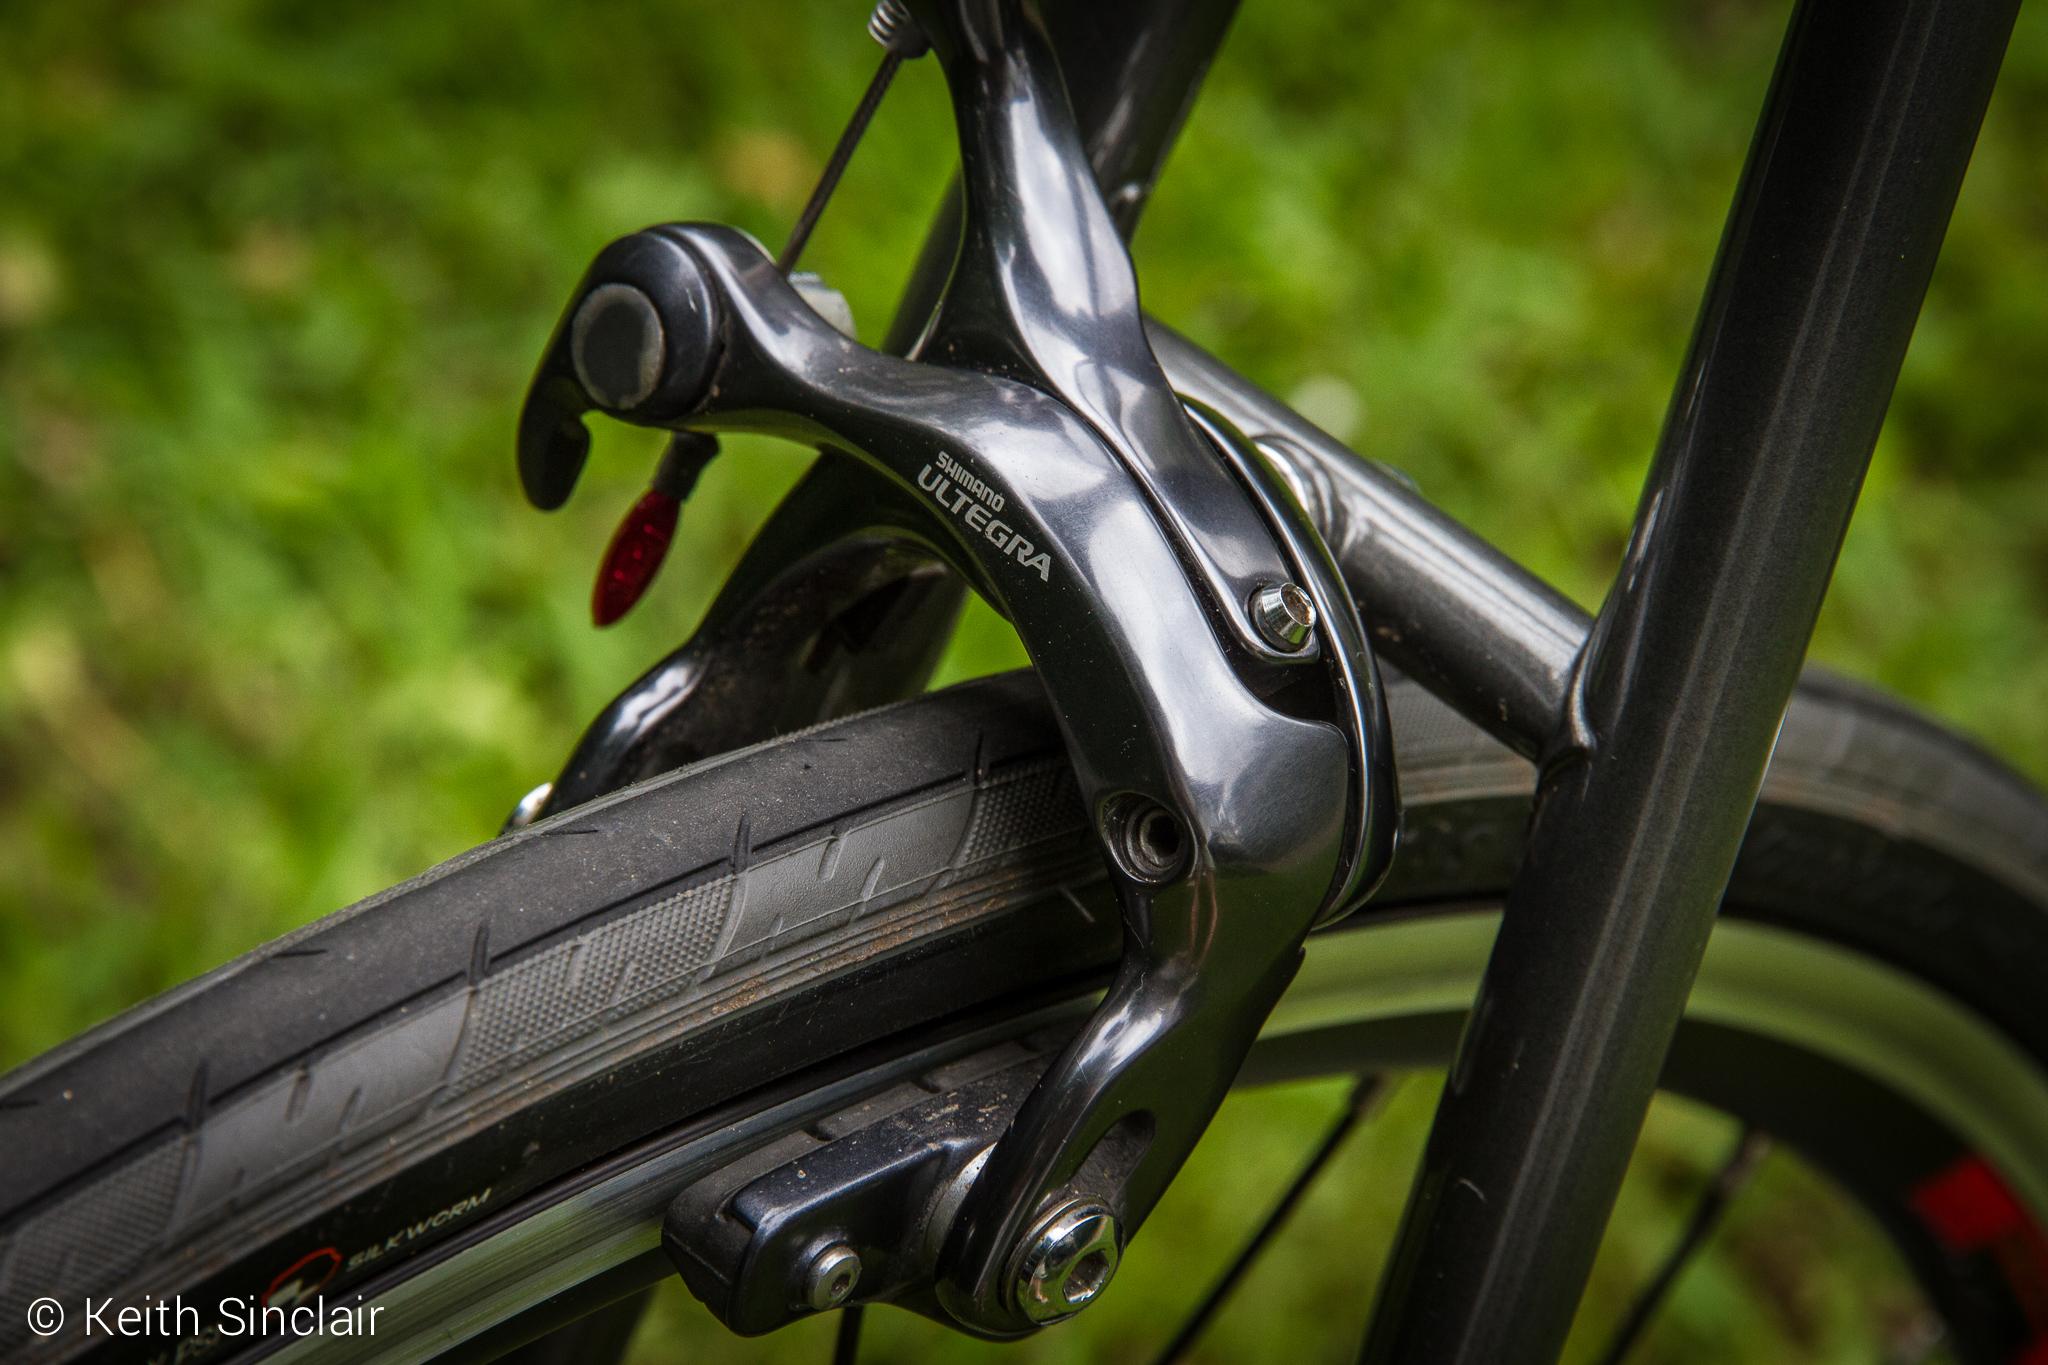 Shimano Ultegra Rear Brakes